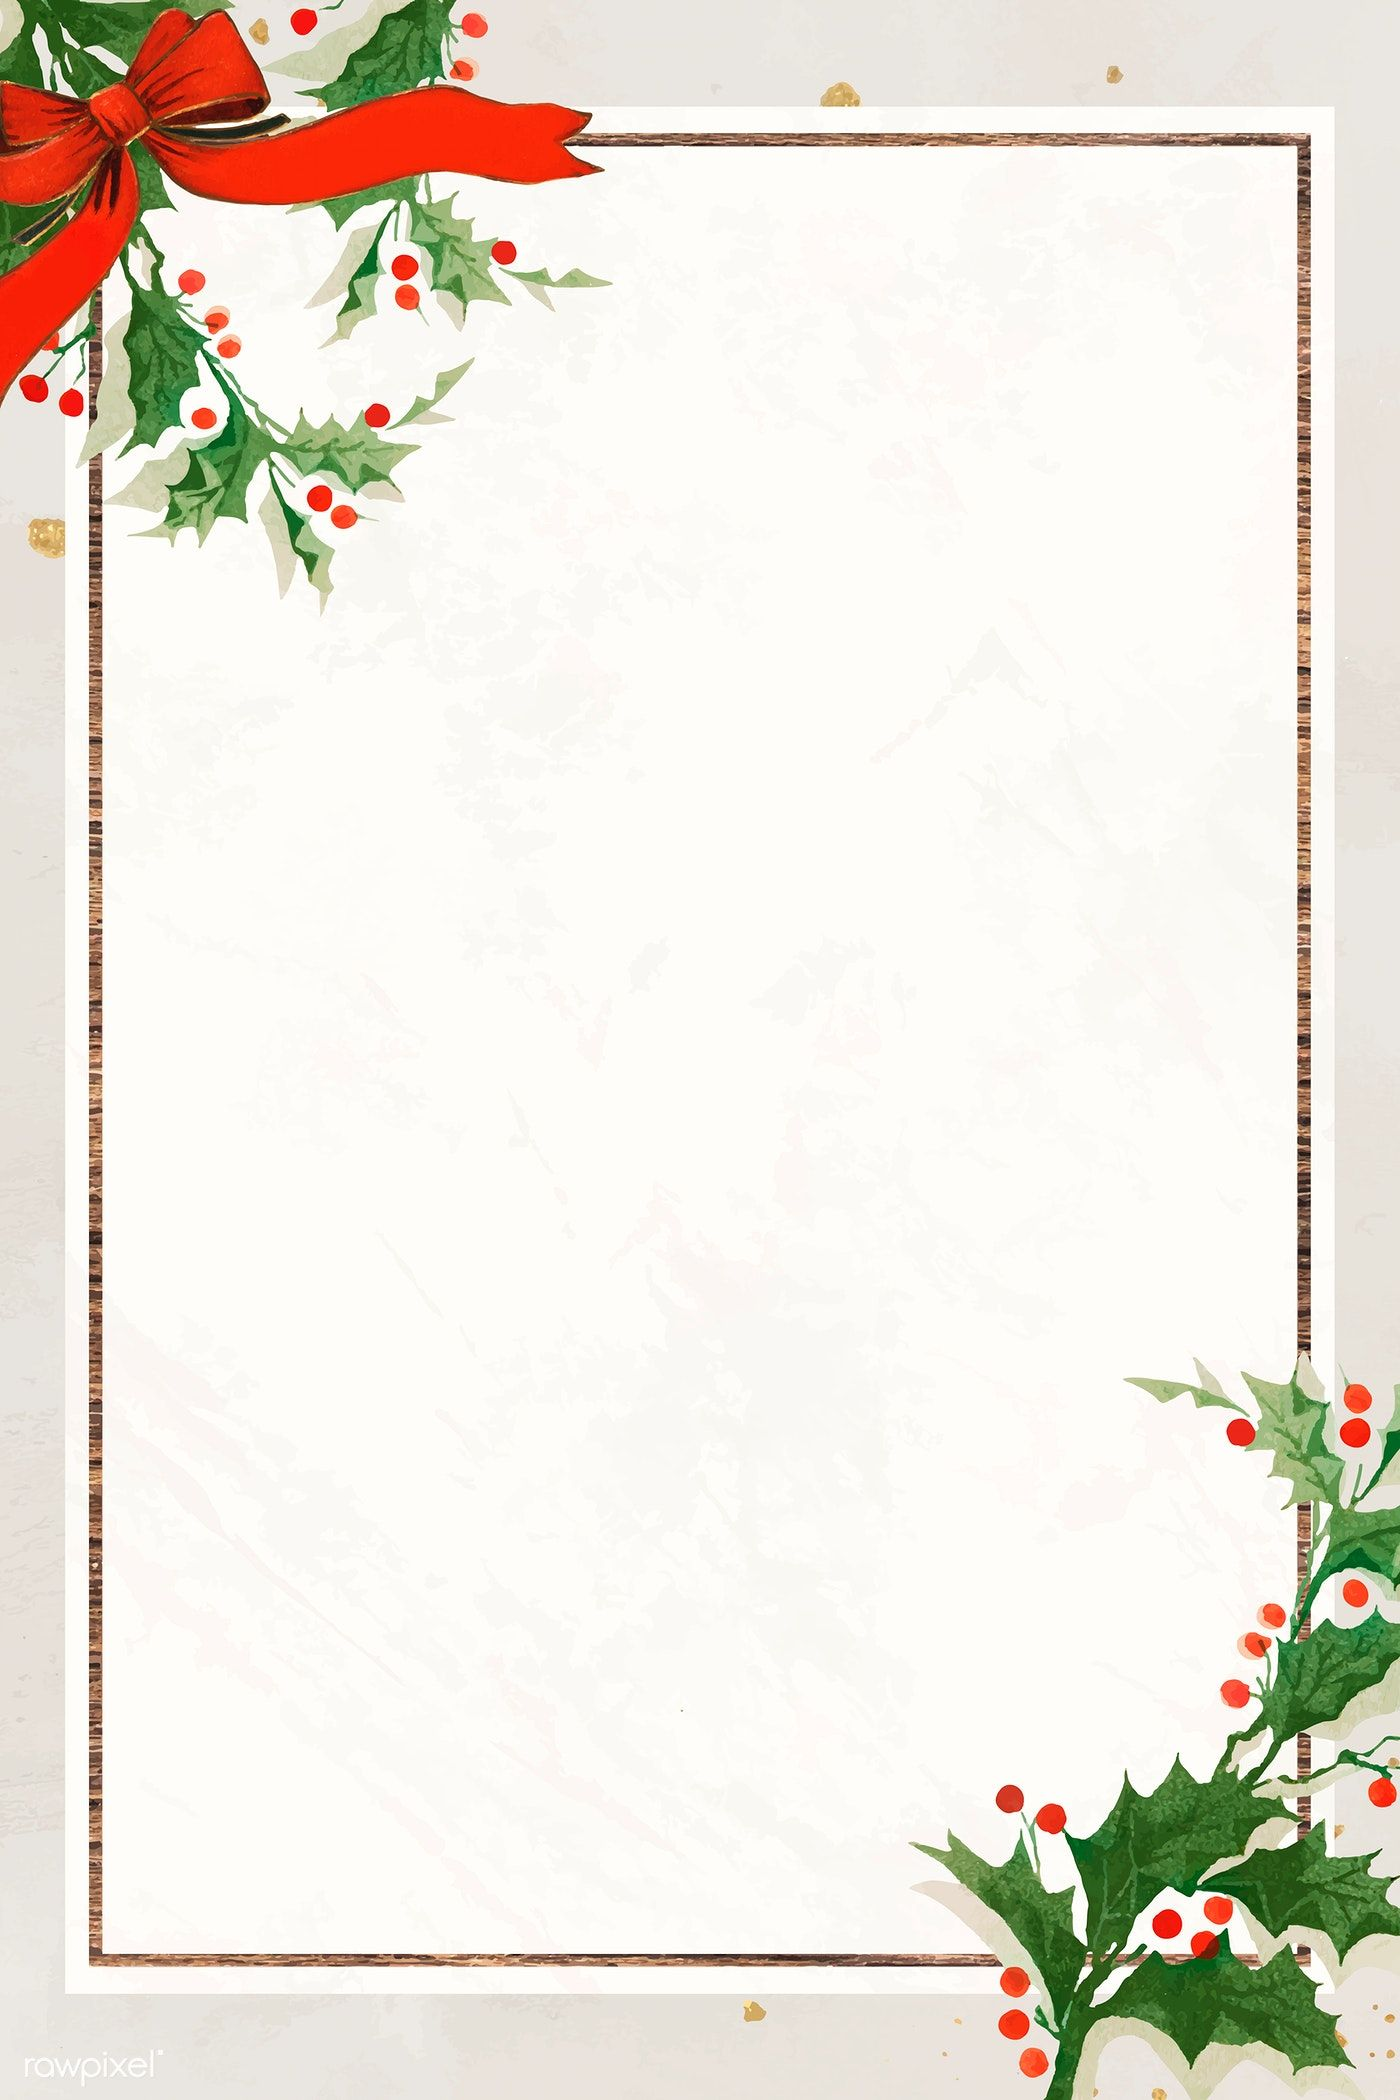 Download premium vector of Blank festive rectangular